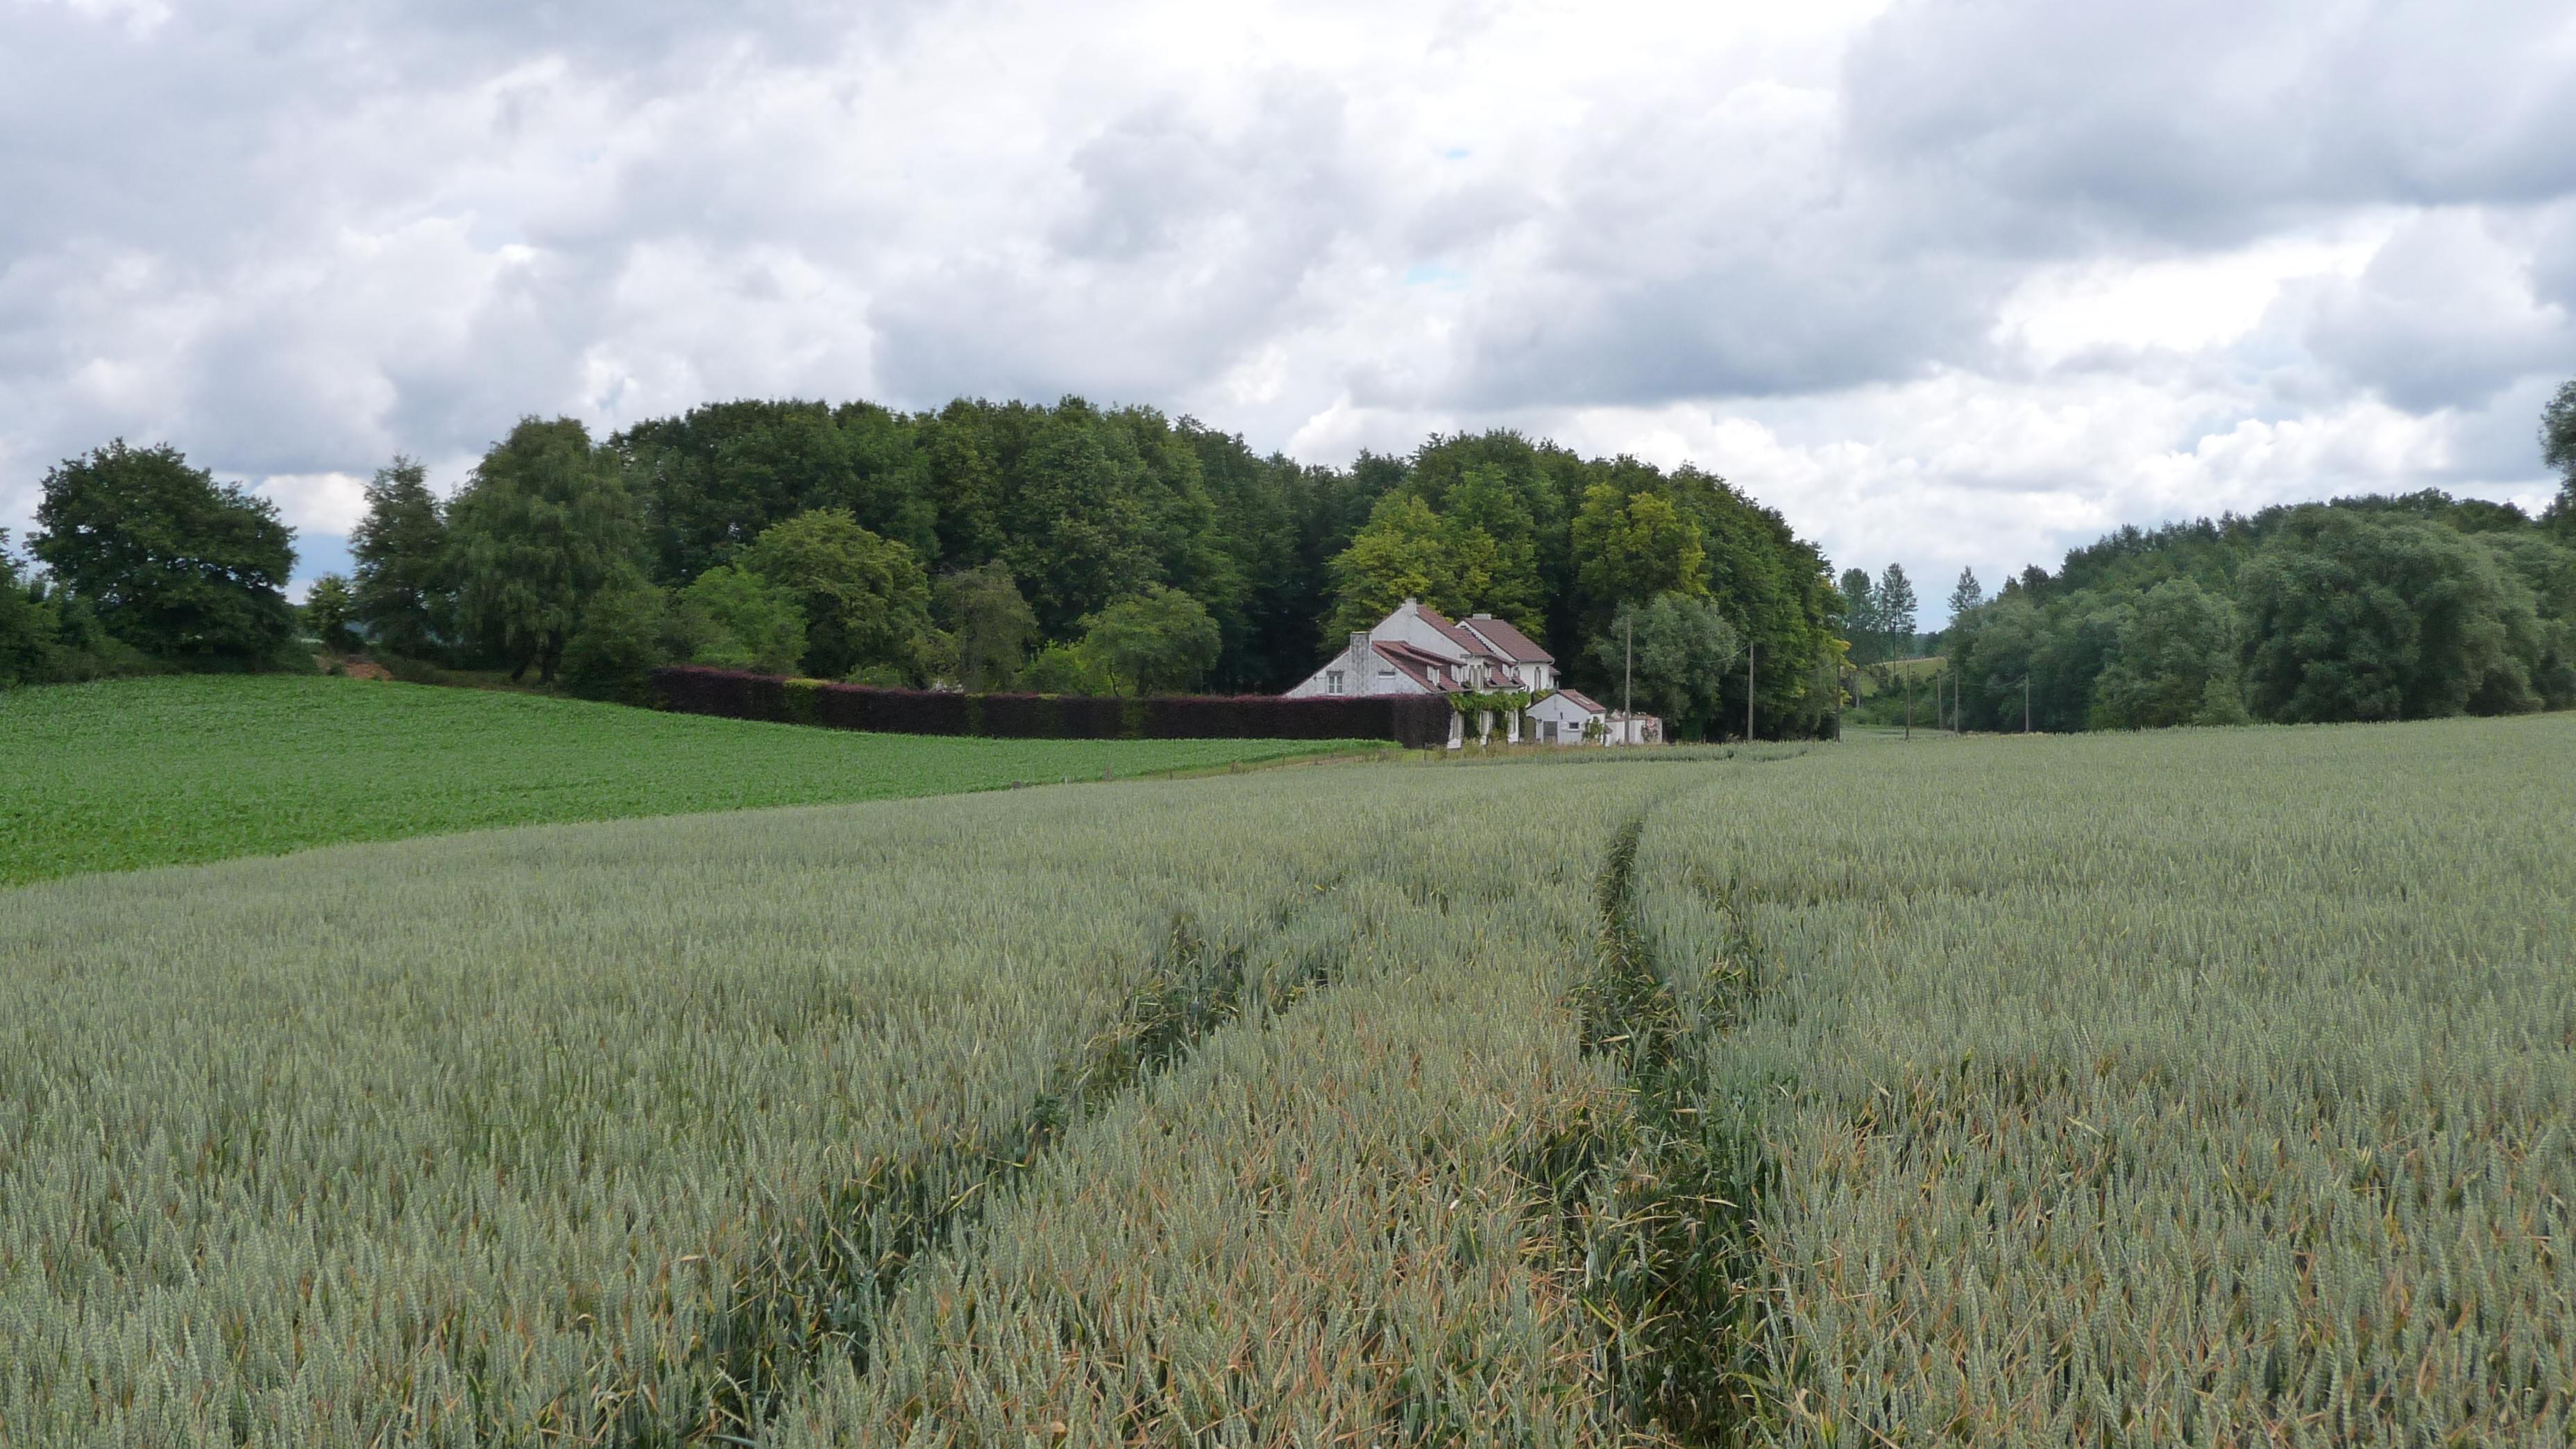 Fields in Bossut. Belgium